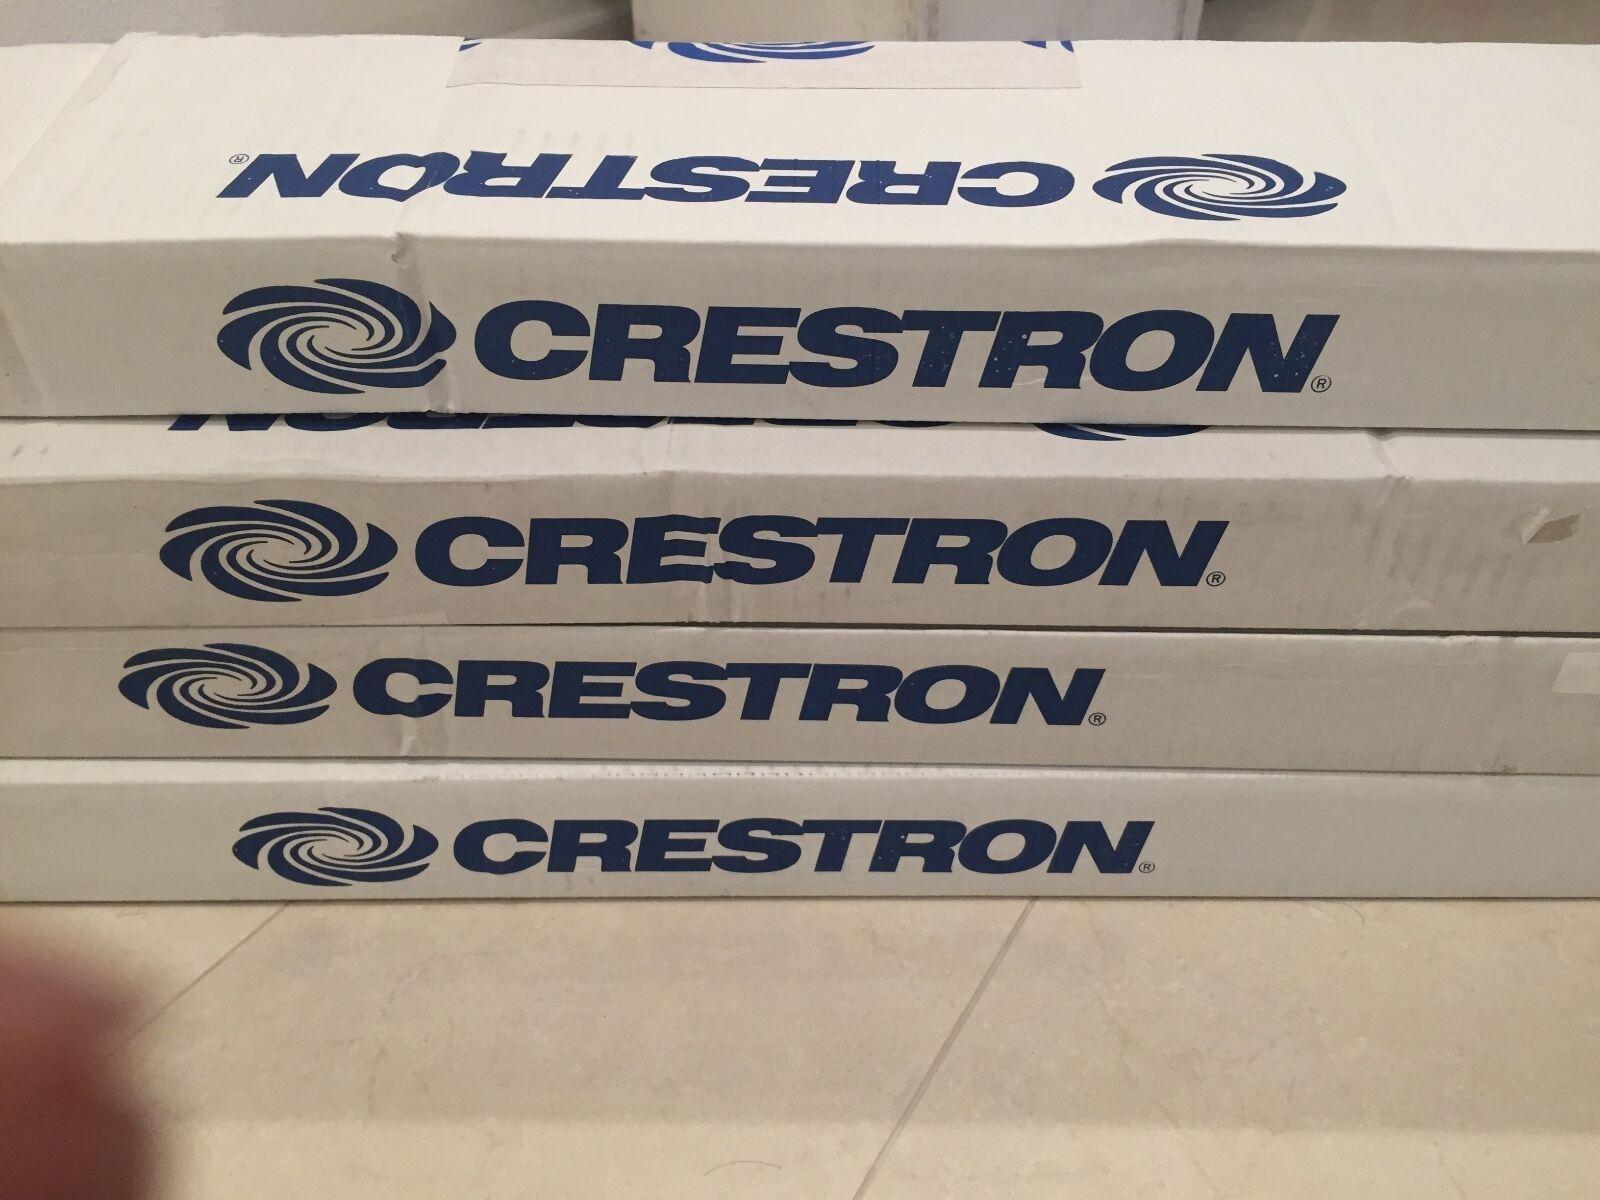 New Crestron MSMK-4SM-W-S Multi-Surface Mount Kit for TPMC-4SM(D) / TPCS-4SM(D)